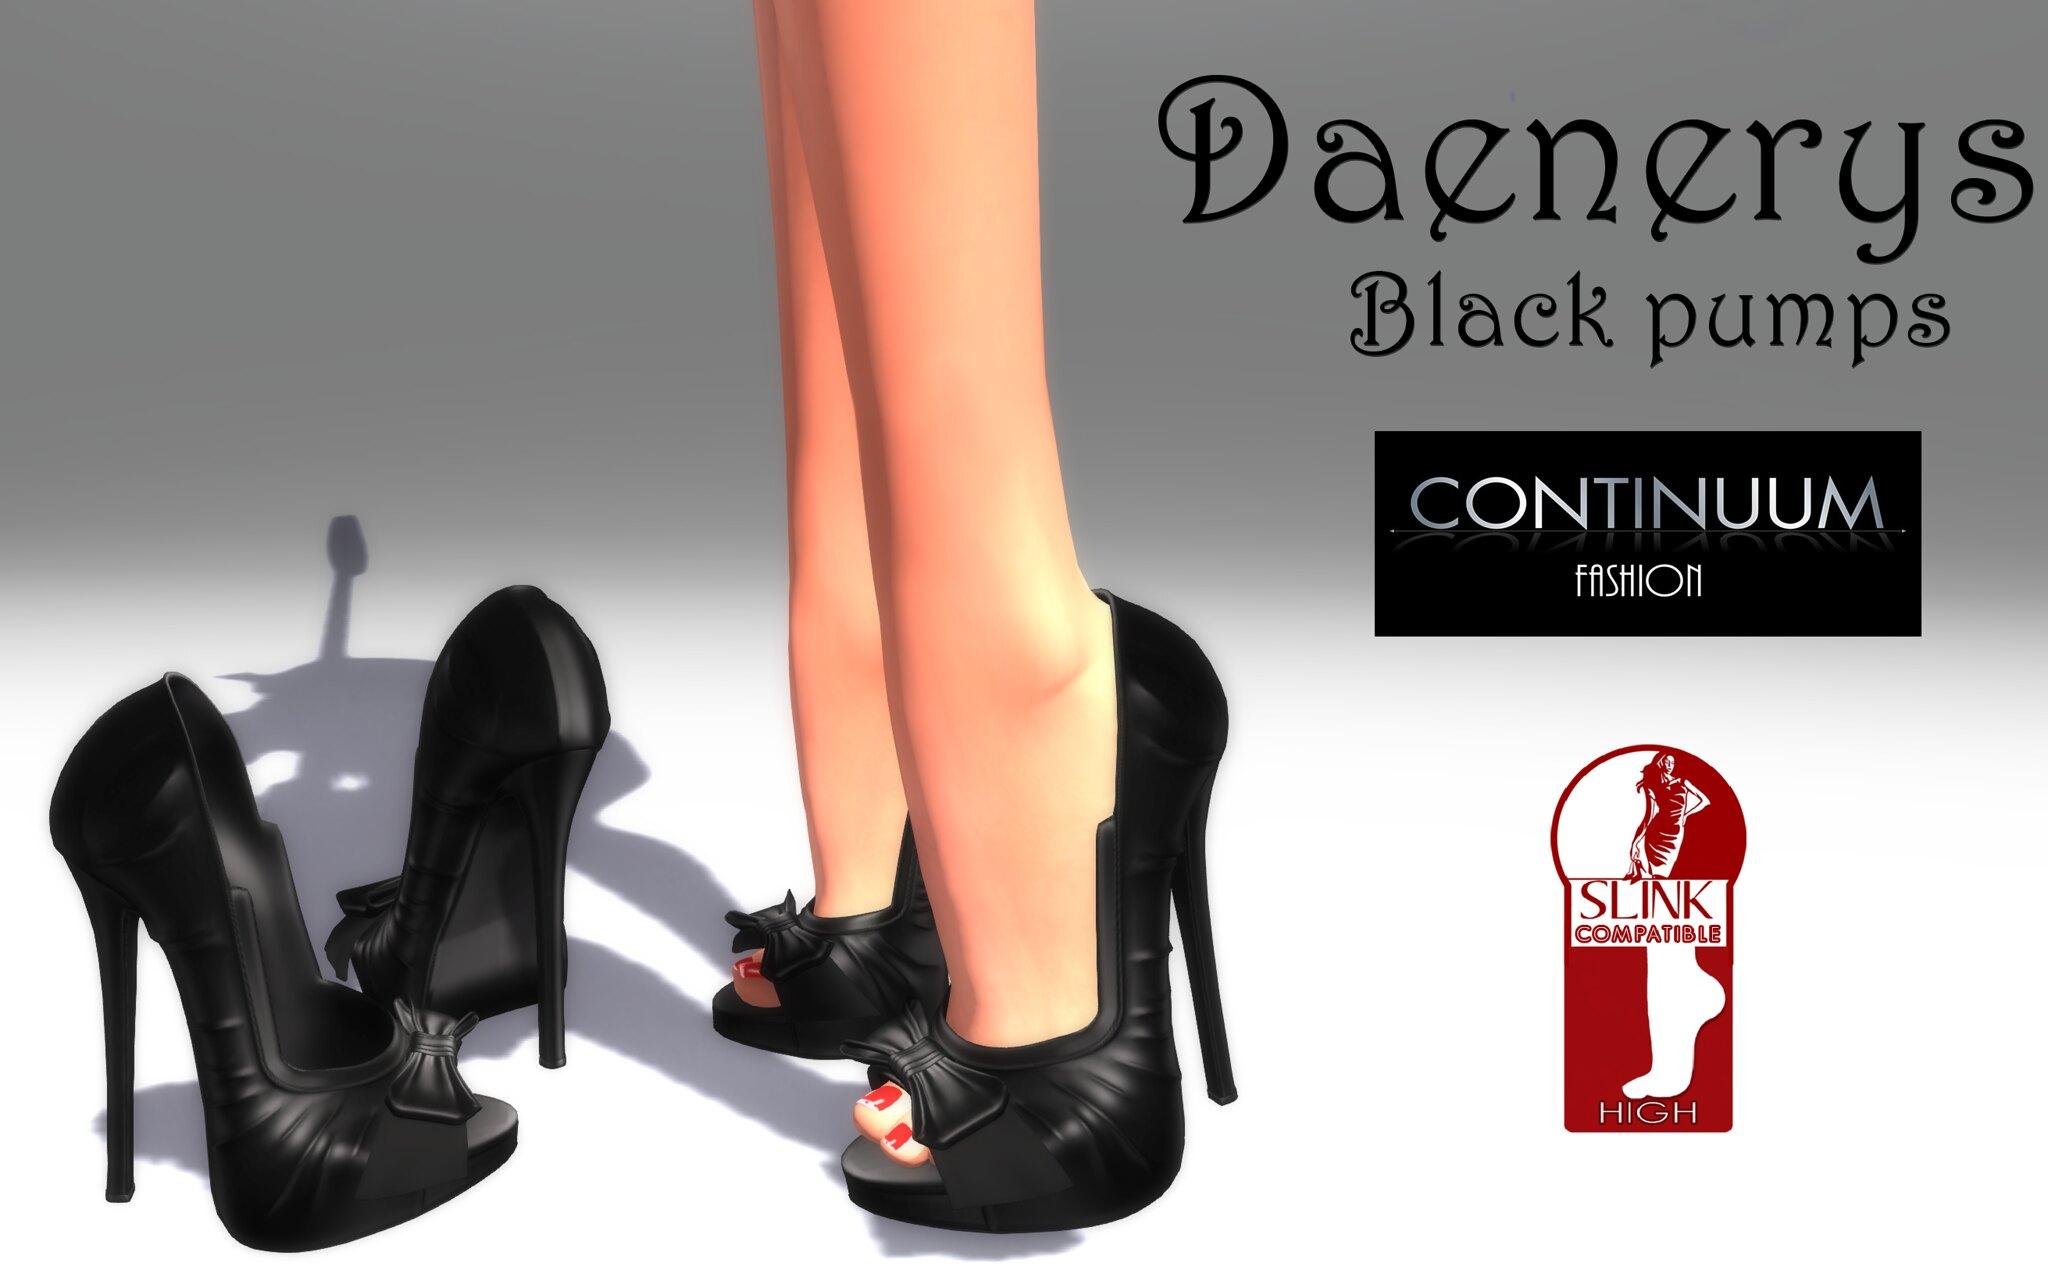 Continuum Daenerys pump black